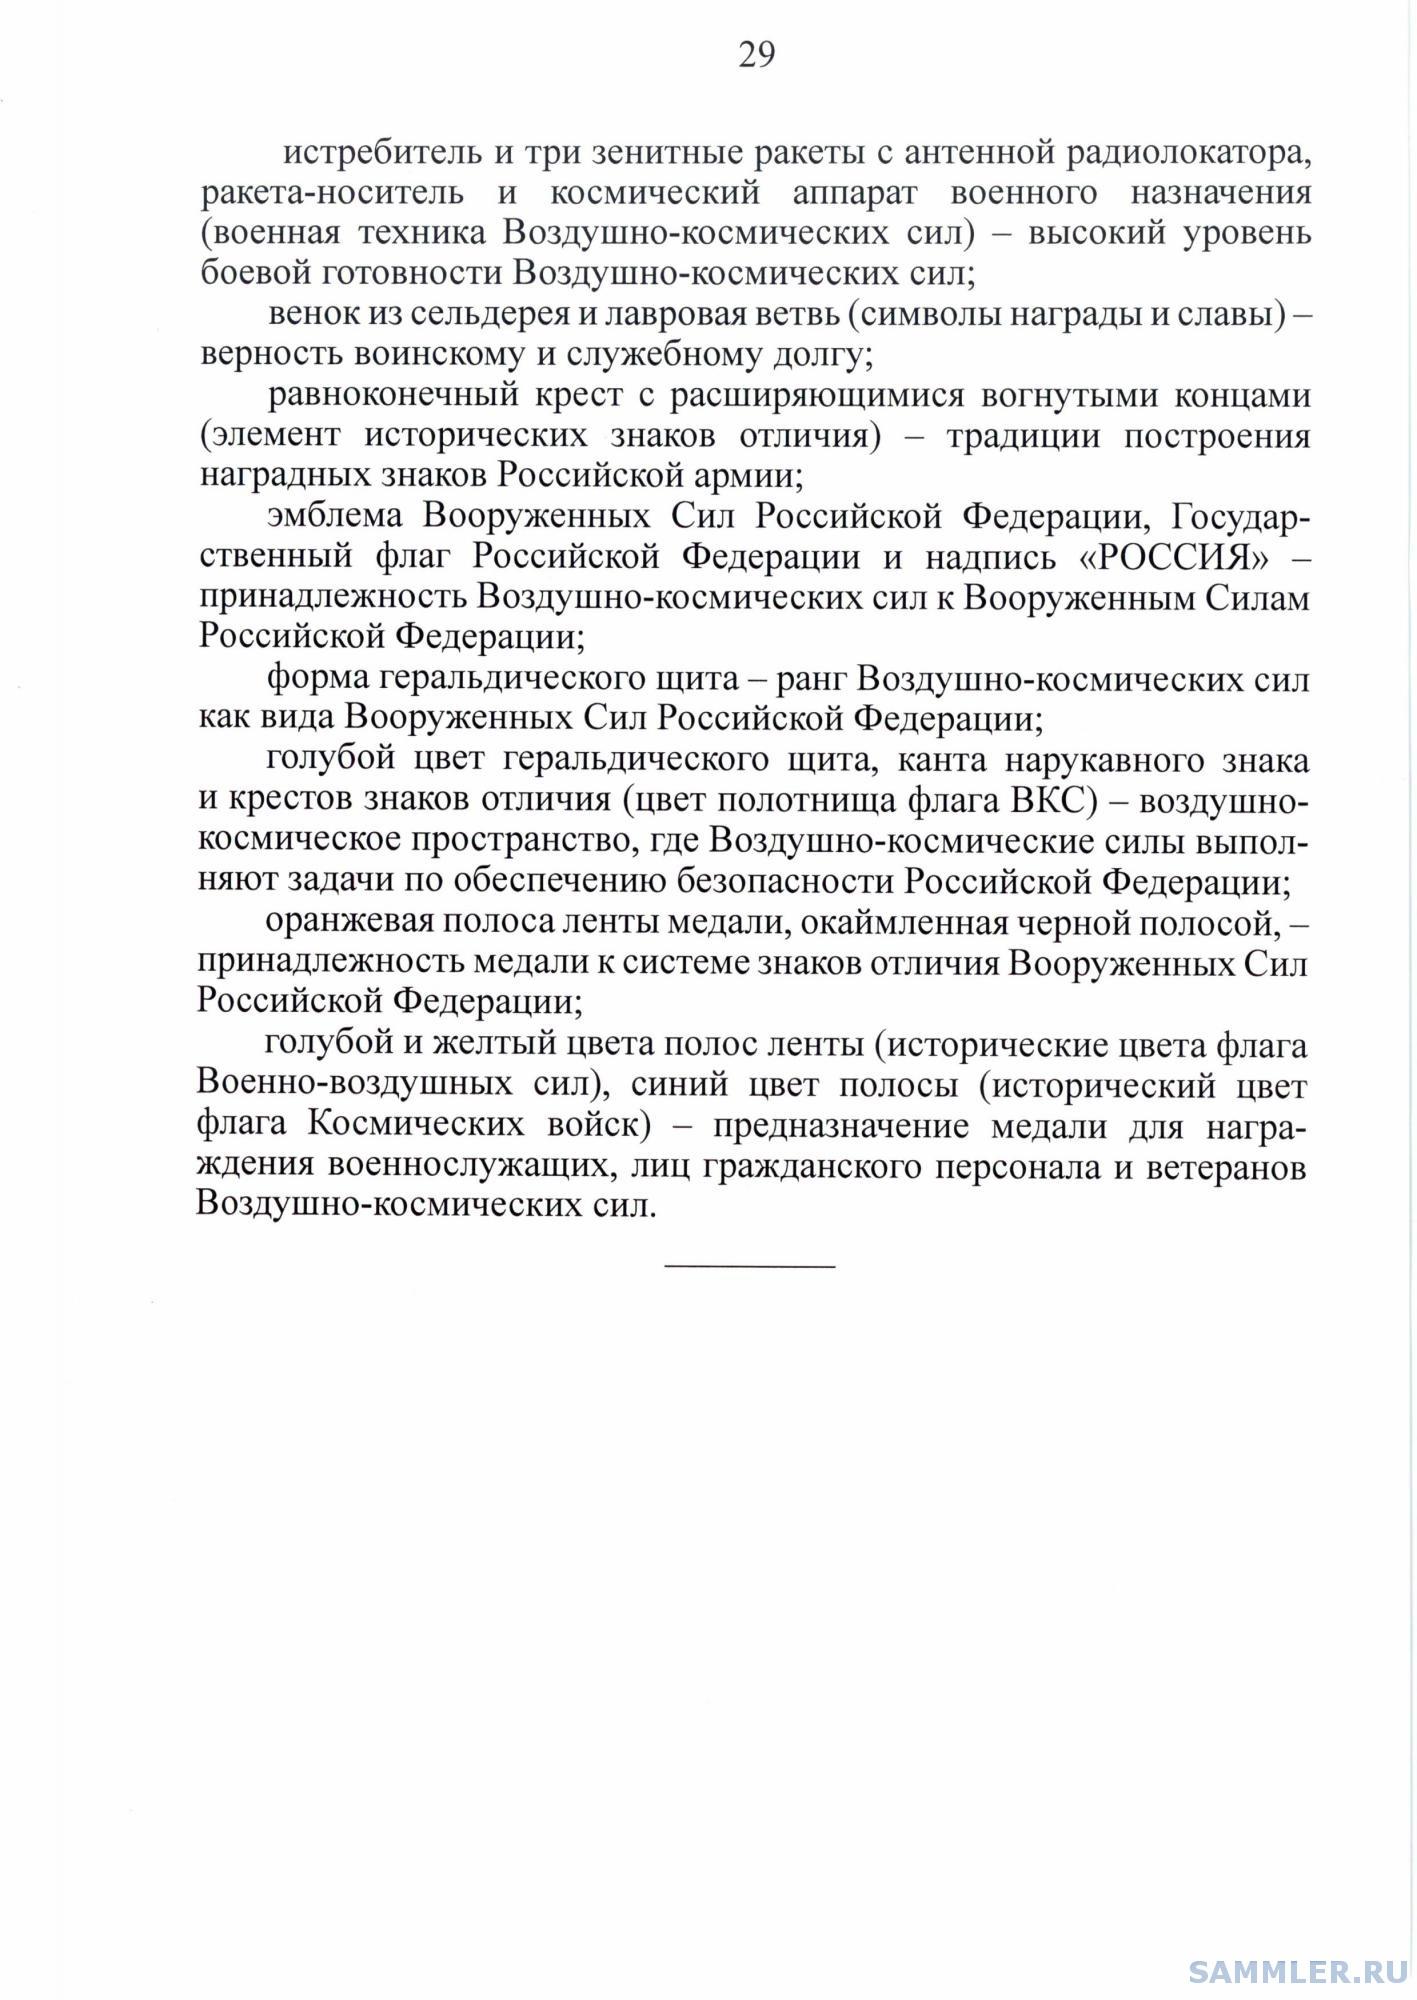 МО РФ 470(цвет)-29.jpg